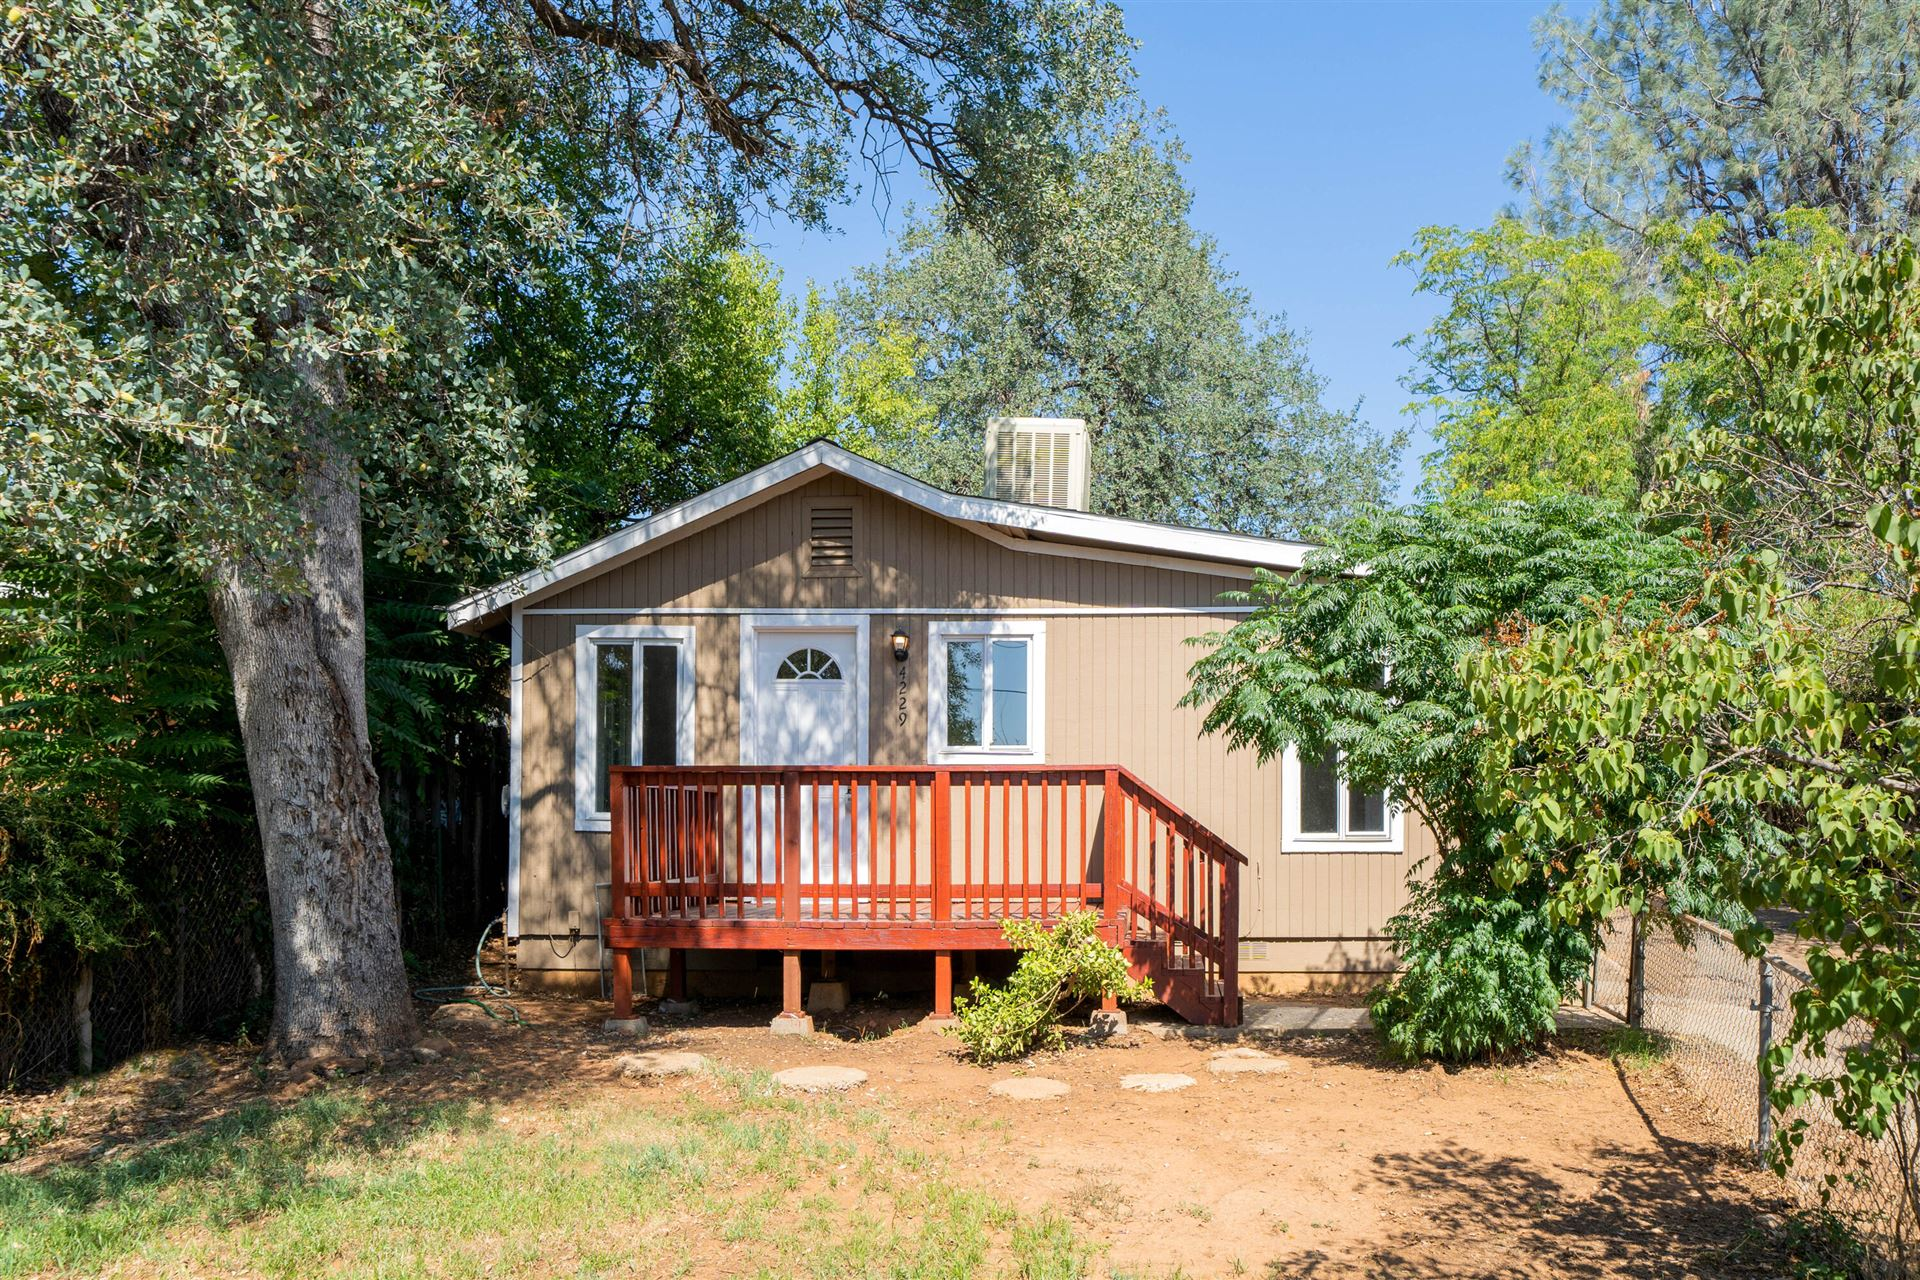 4229 Chico St, Shasta Lake, CA 96019 - MLS#: 21-4436